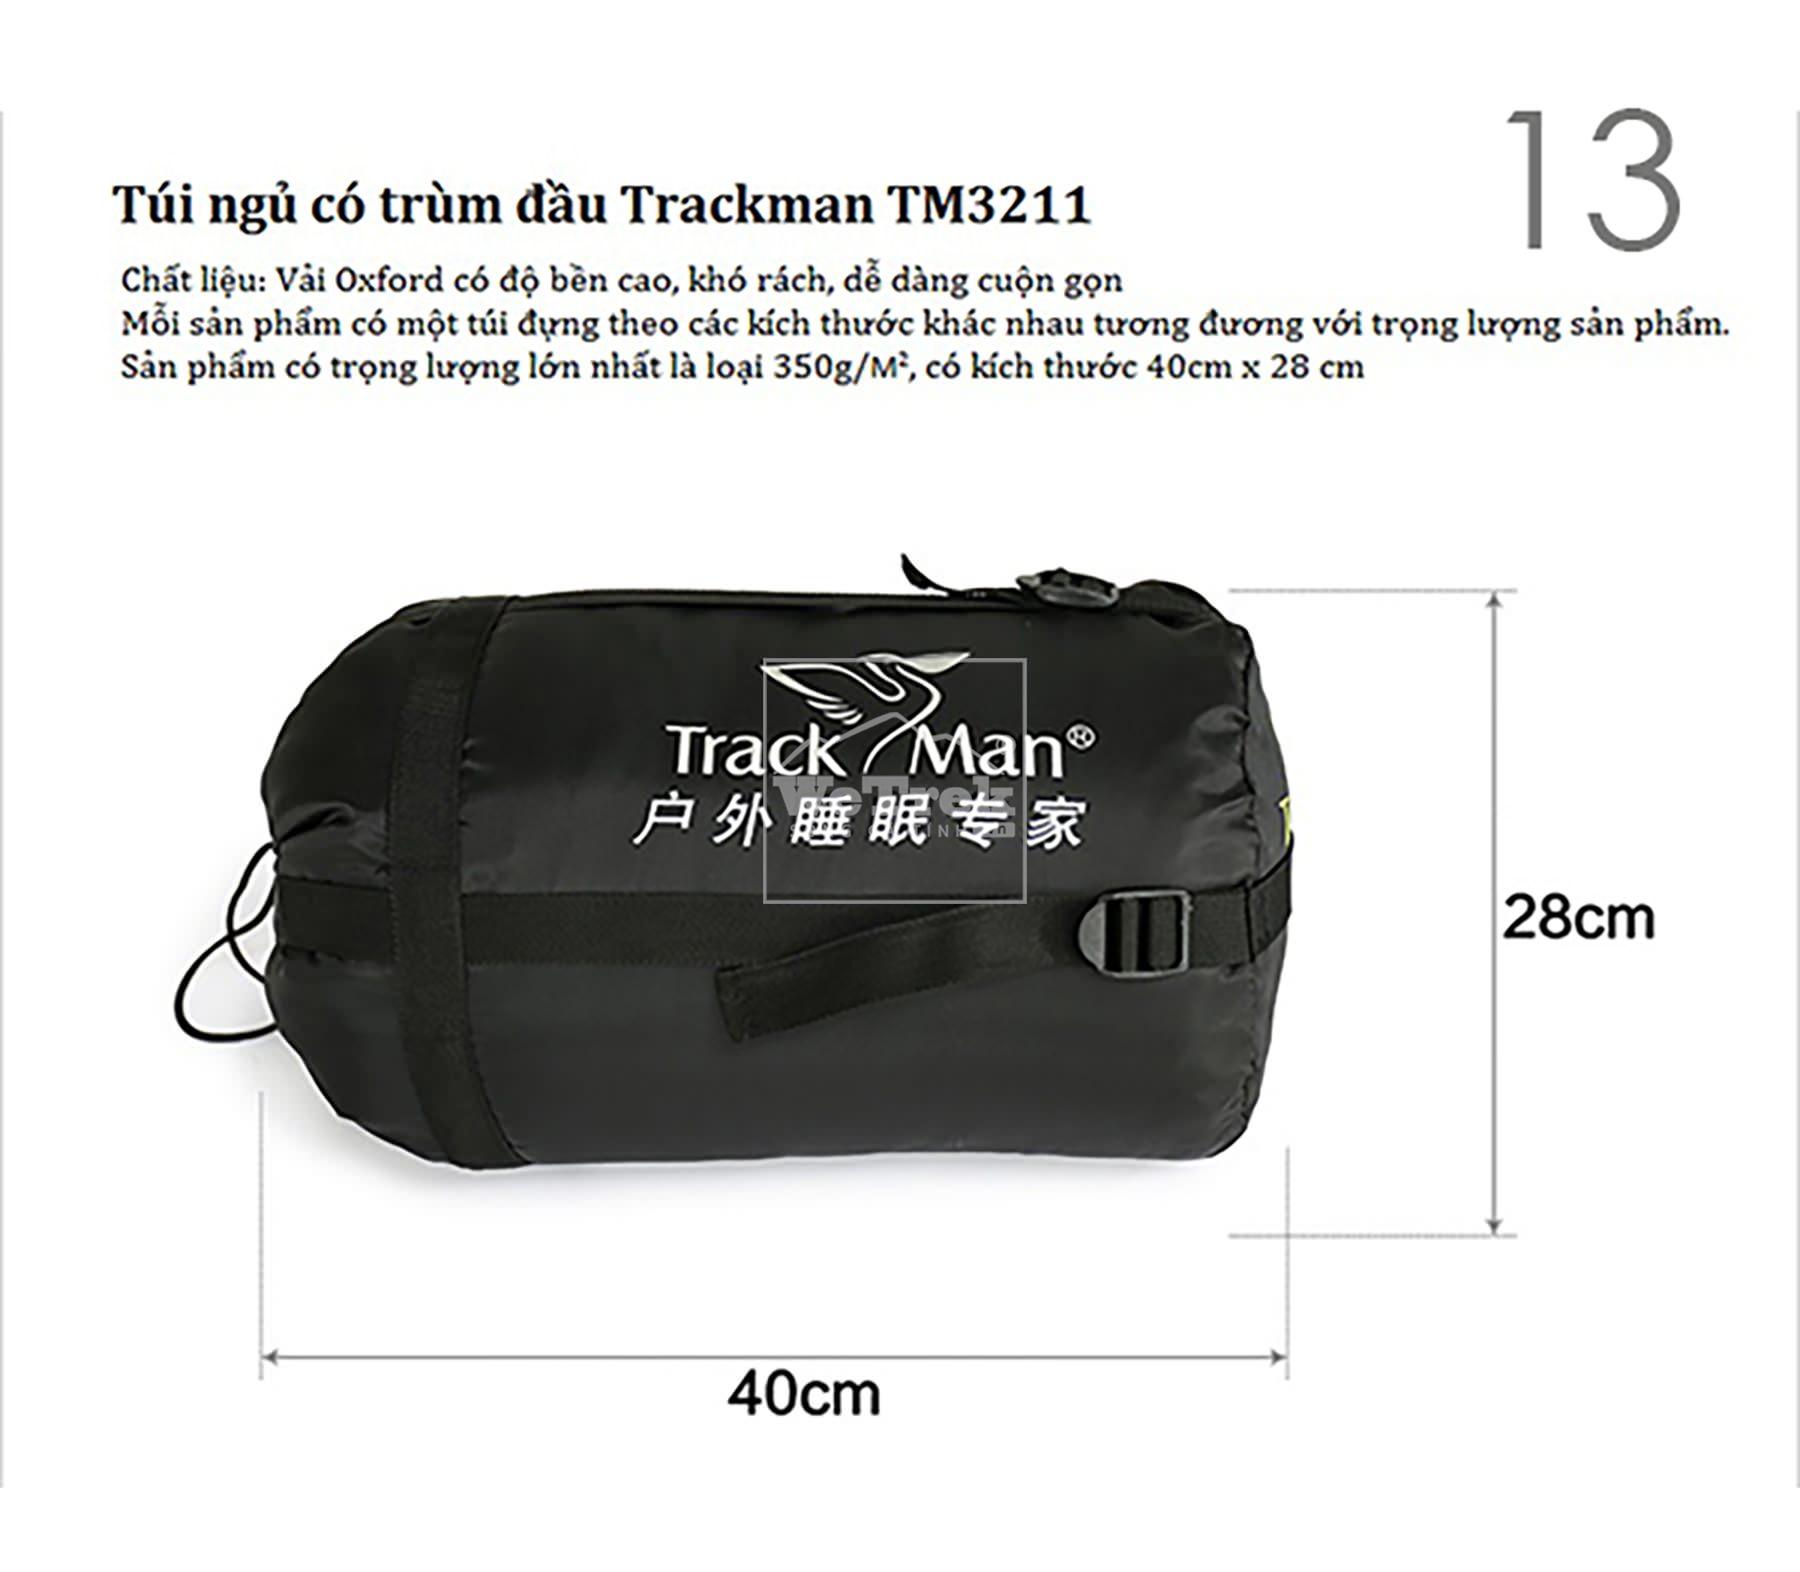 Tui-ngu-du-lich-Track-Man-co-trum-dau-TM3211-300-gram-3.jpg